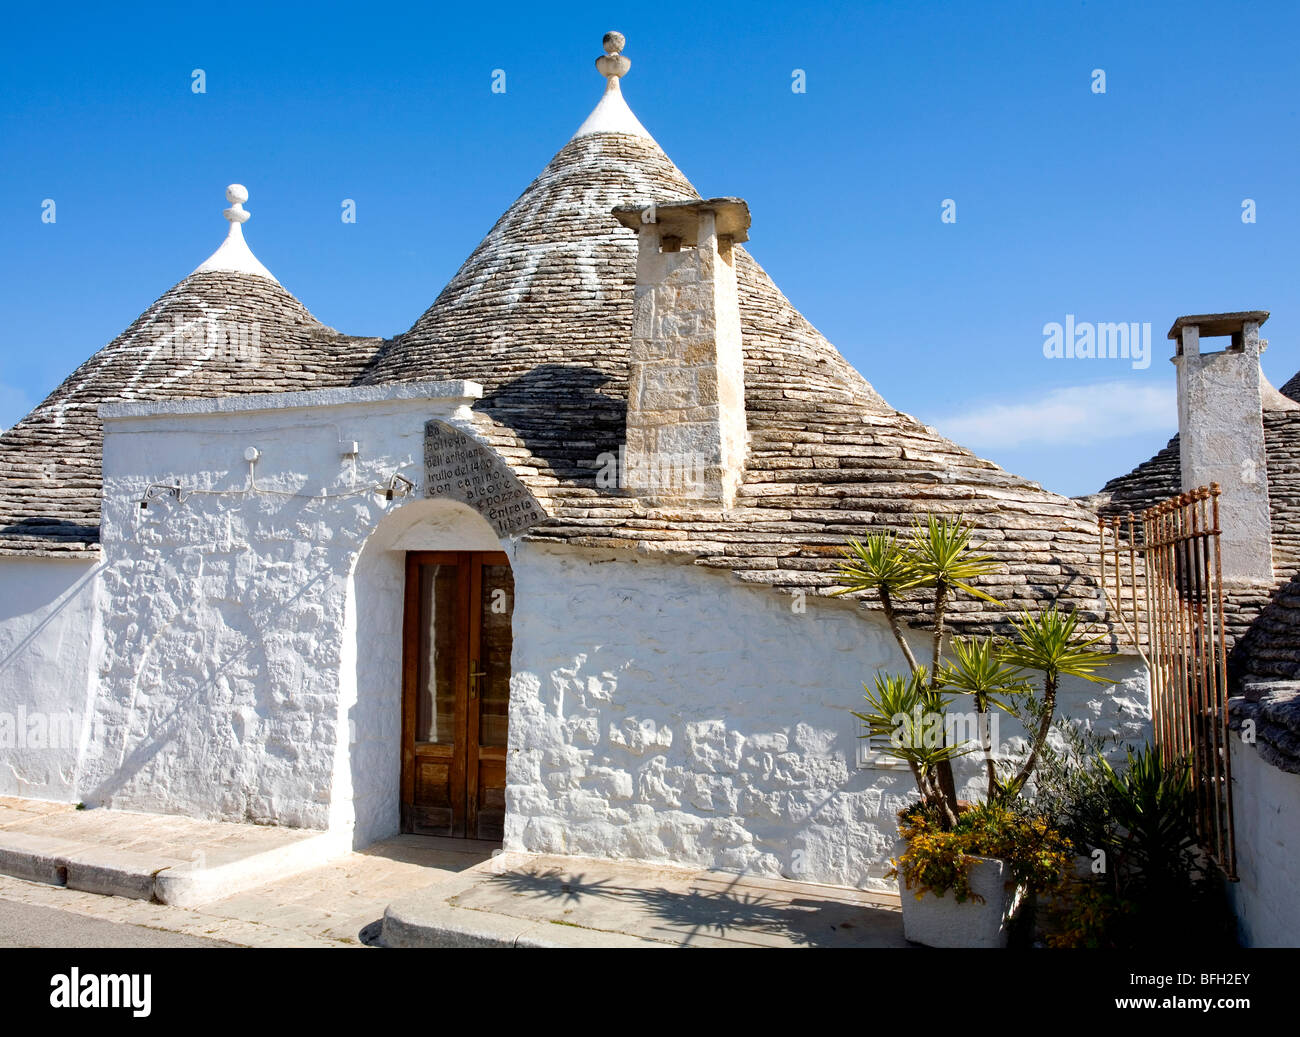 Trulli Casa con signos Hex en Alberobello, Puglia, Italia Imagen De Stock